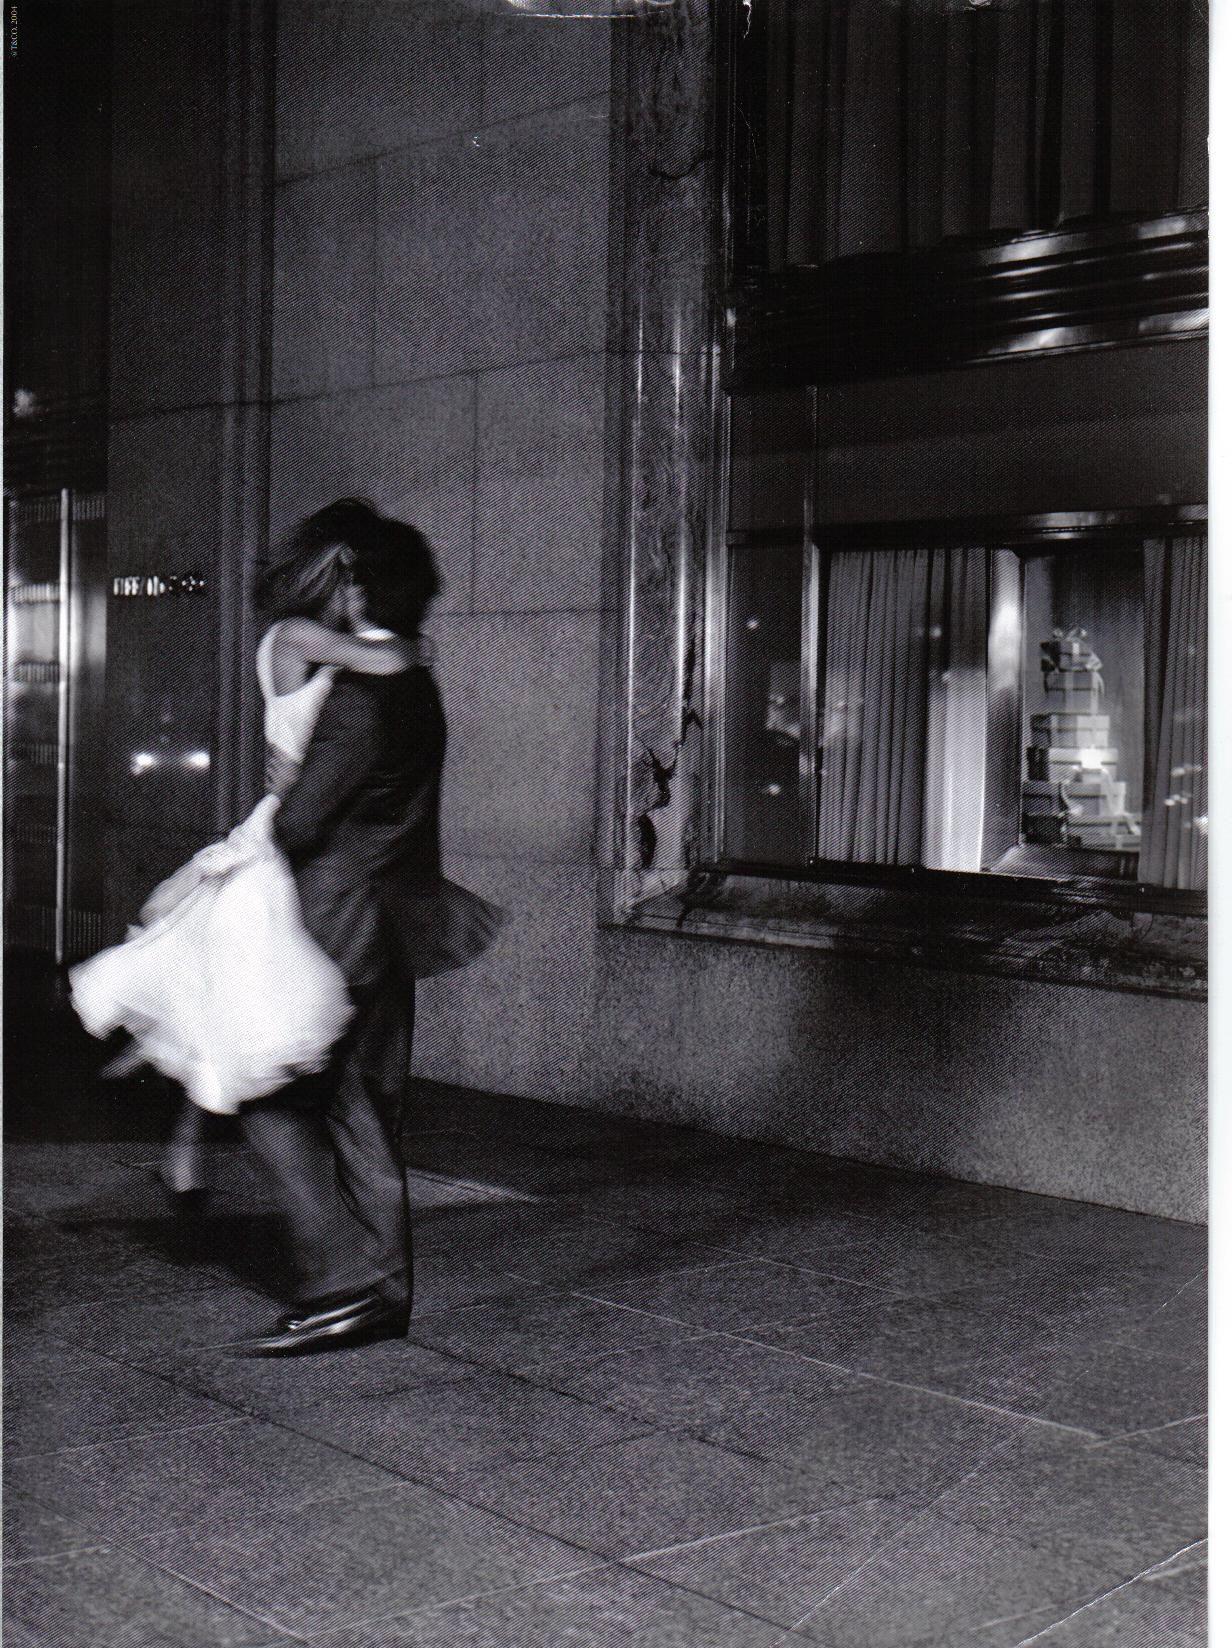 Romance Ak Pinterest Dancing And Street